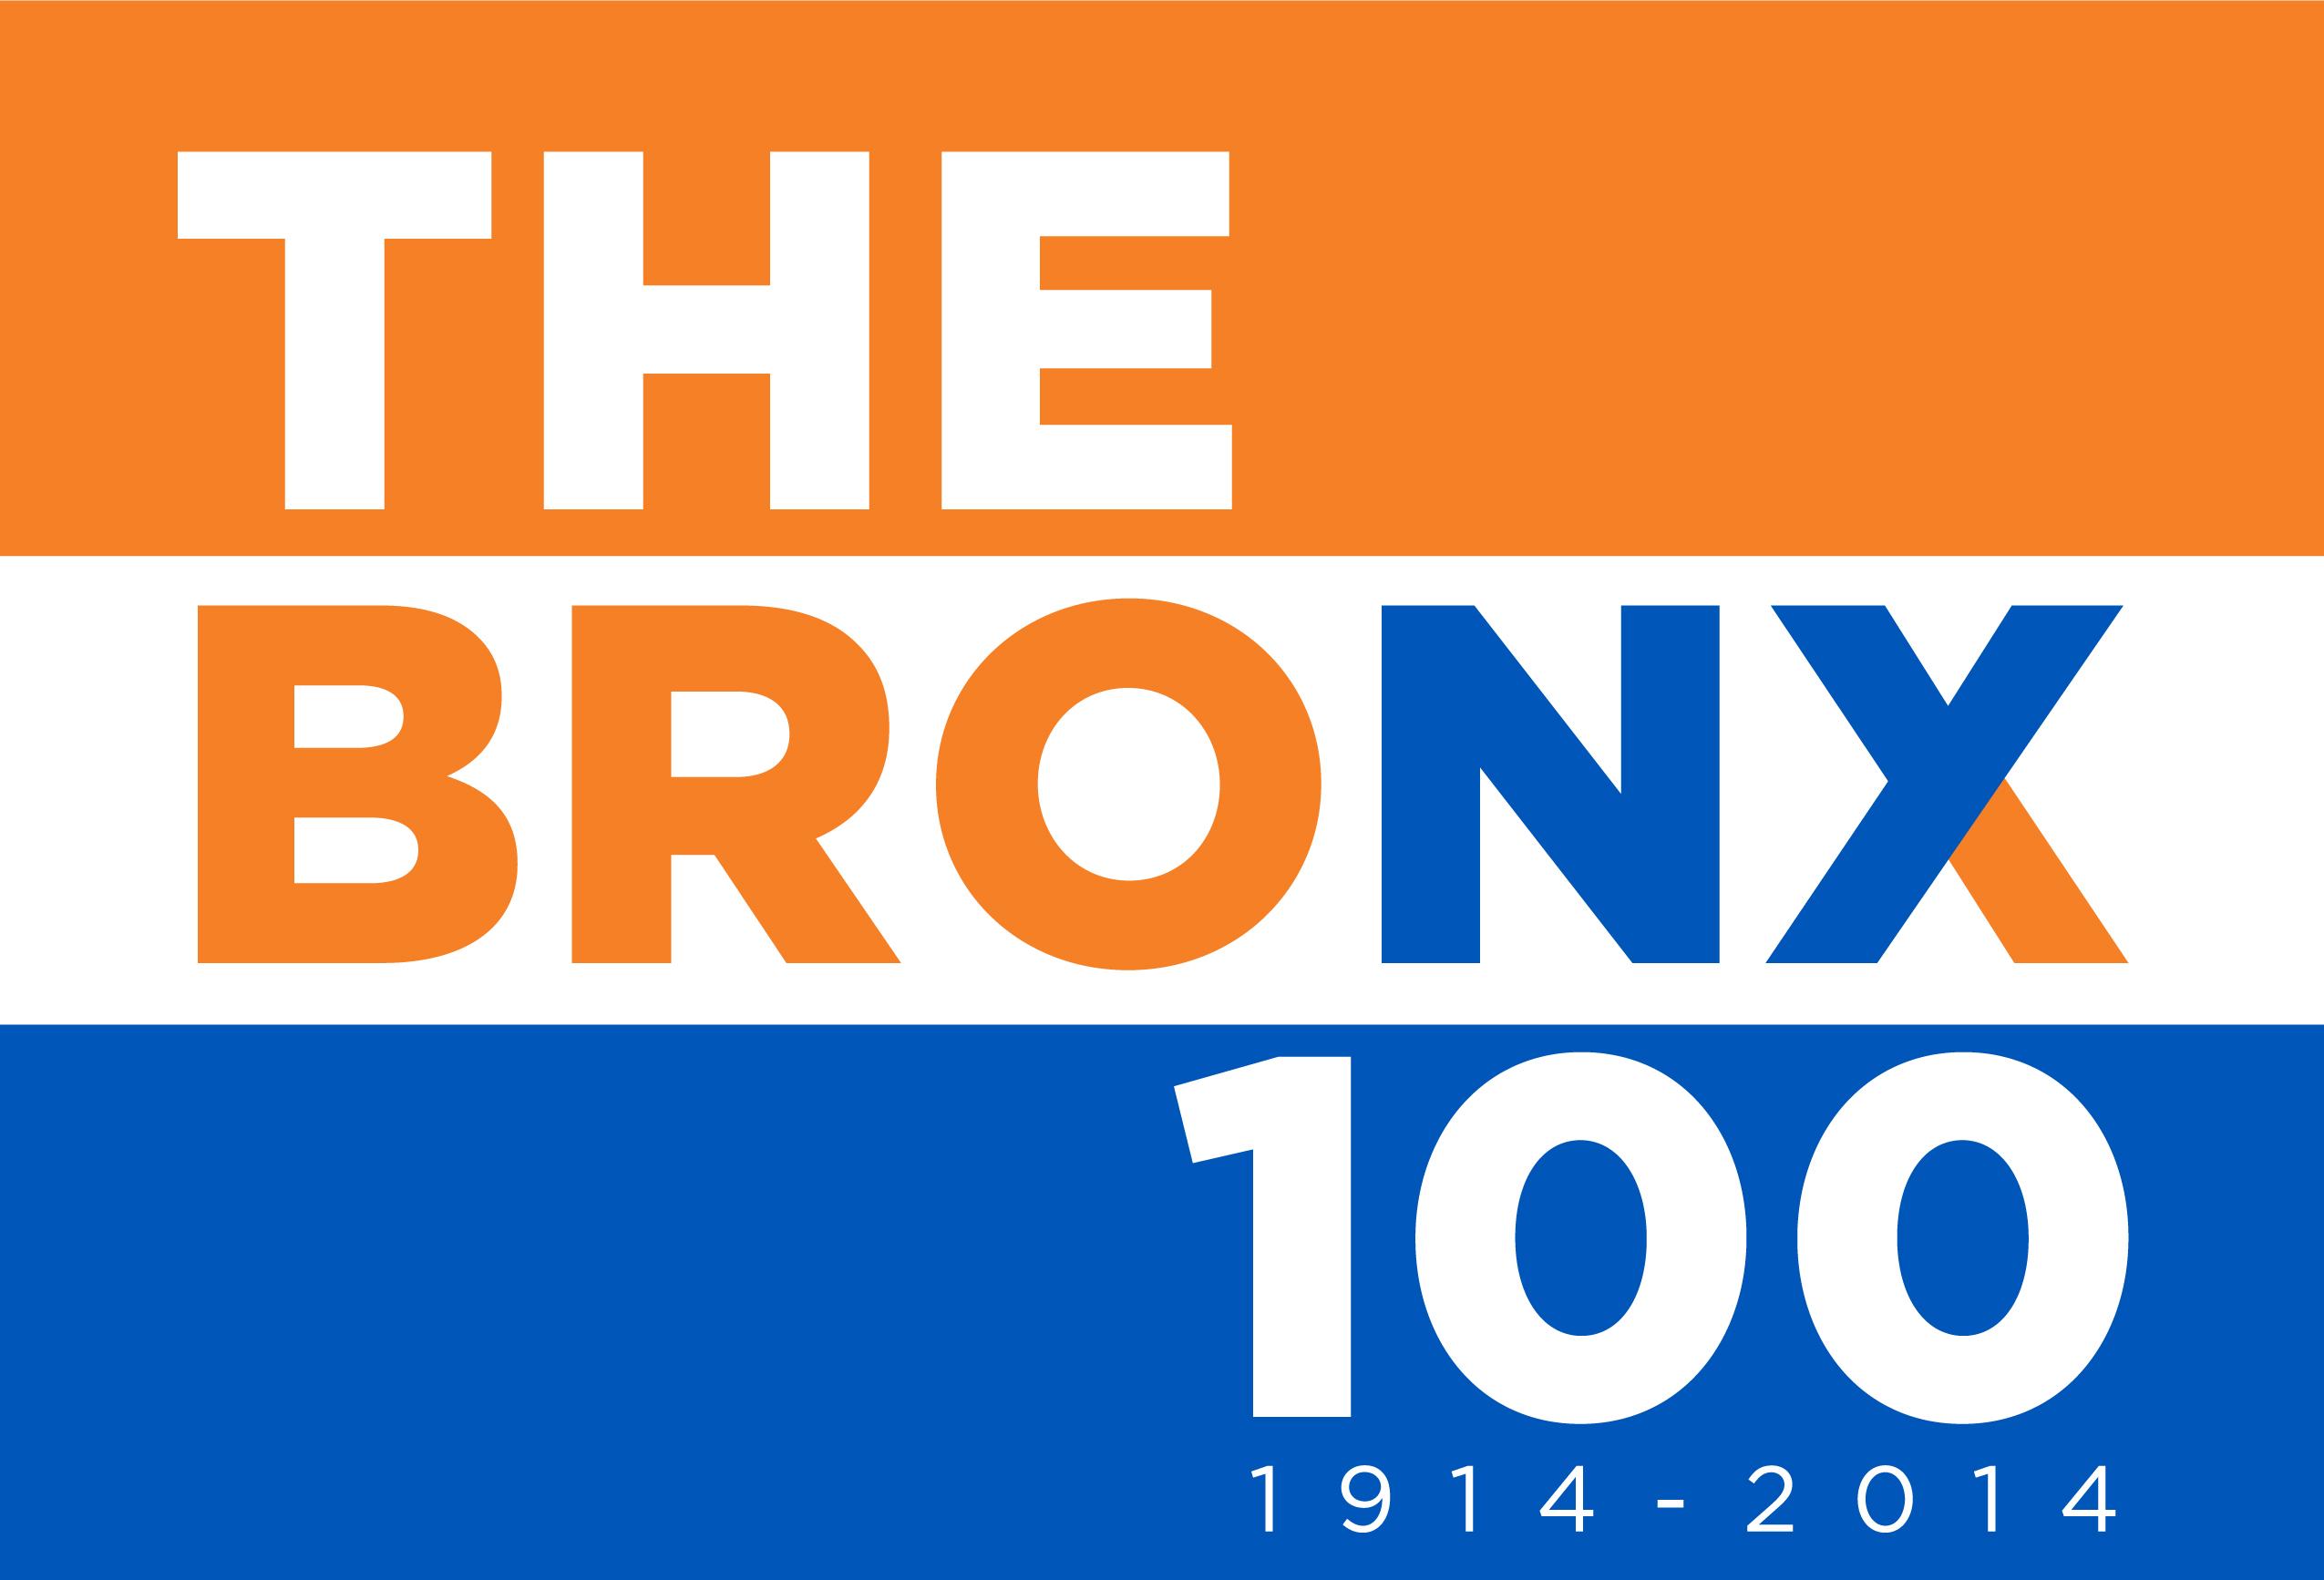 Bronx 100